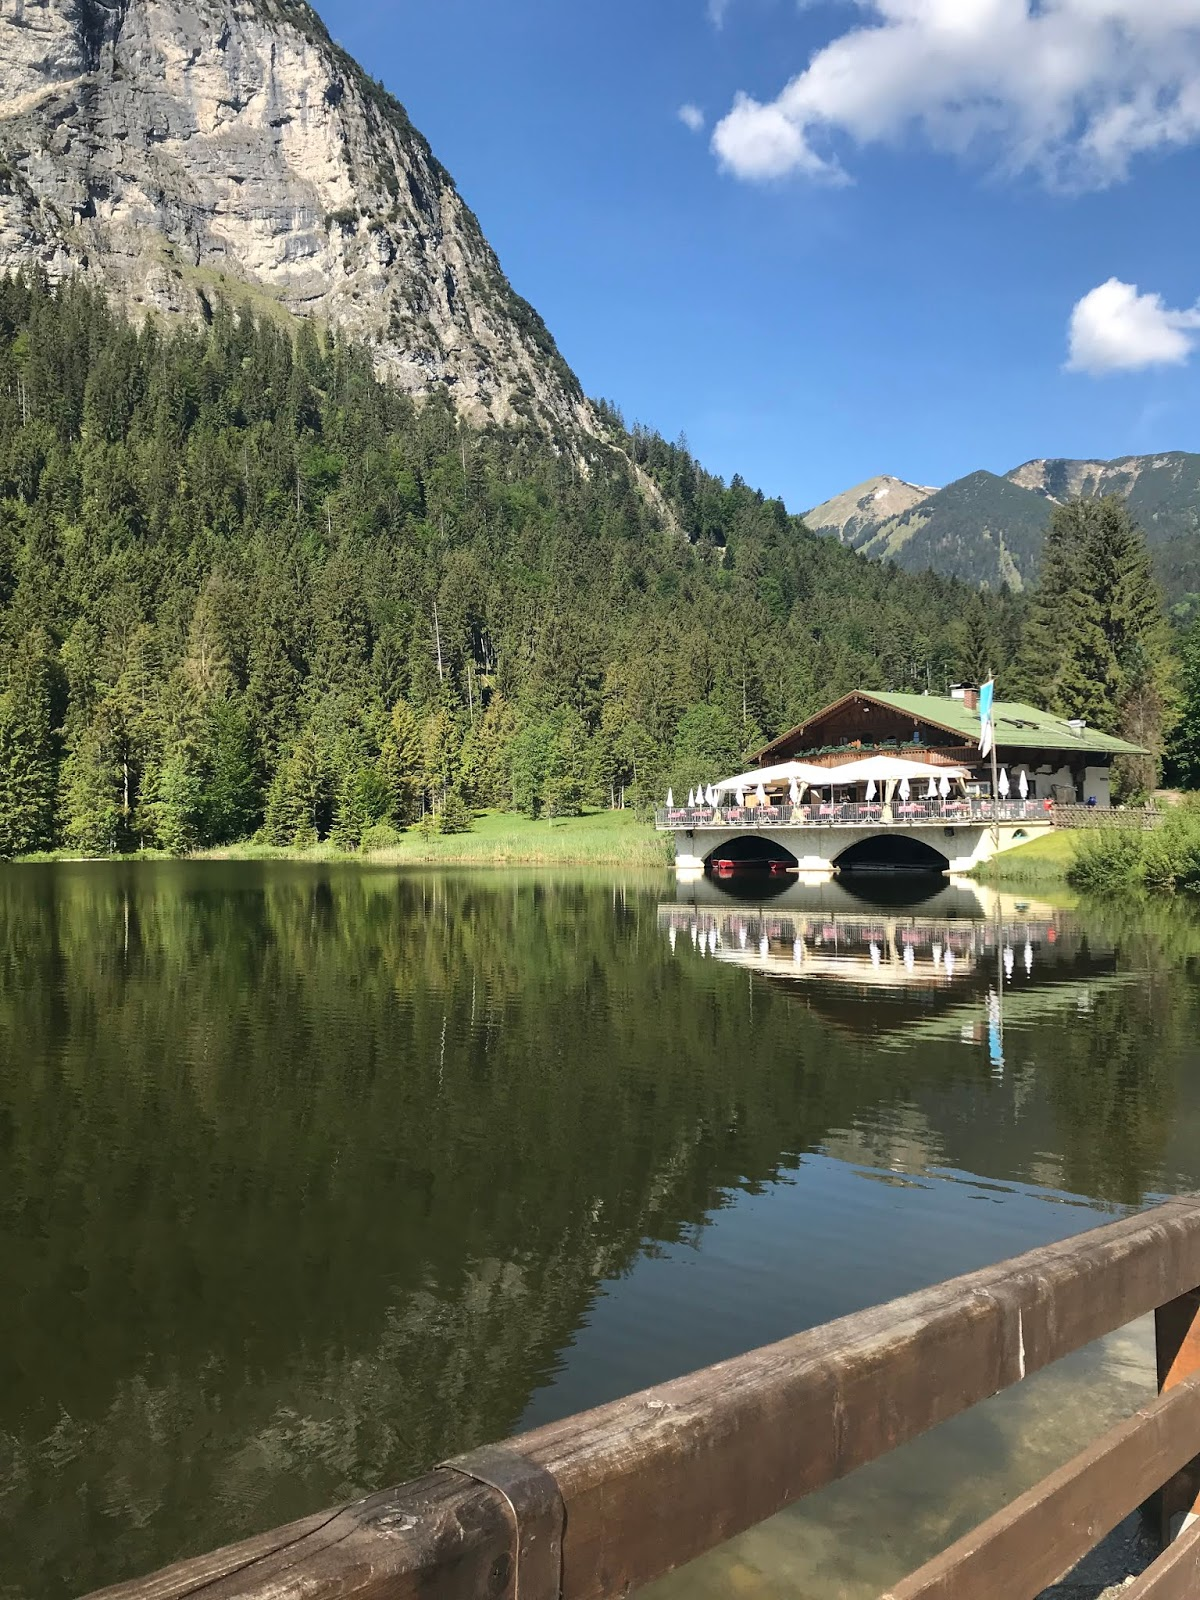 Berggasthof Pflegersee, Hochzeit, Horsebox-Bar, Hochzeitsempfang, mobile Bar, Pop-up-Bar, Bar-Team, Event-Bar, rent a Bar, Garmisch-Partenkirchen, Hochzeitsbar, 4 Gin & Drinks